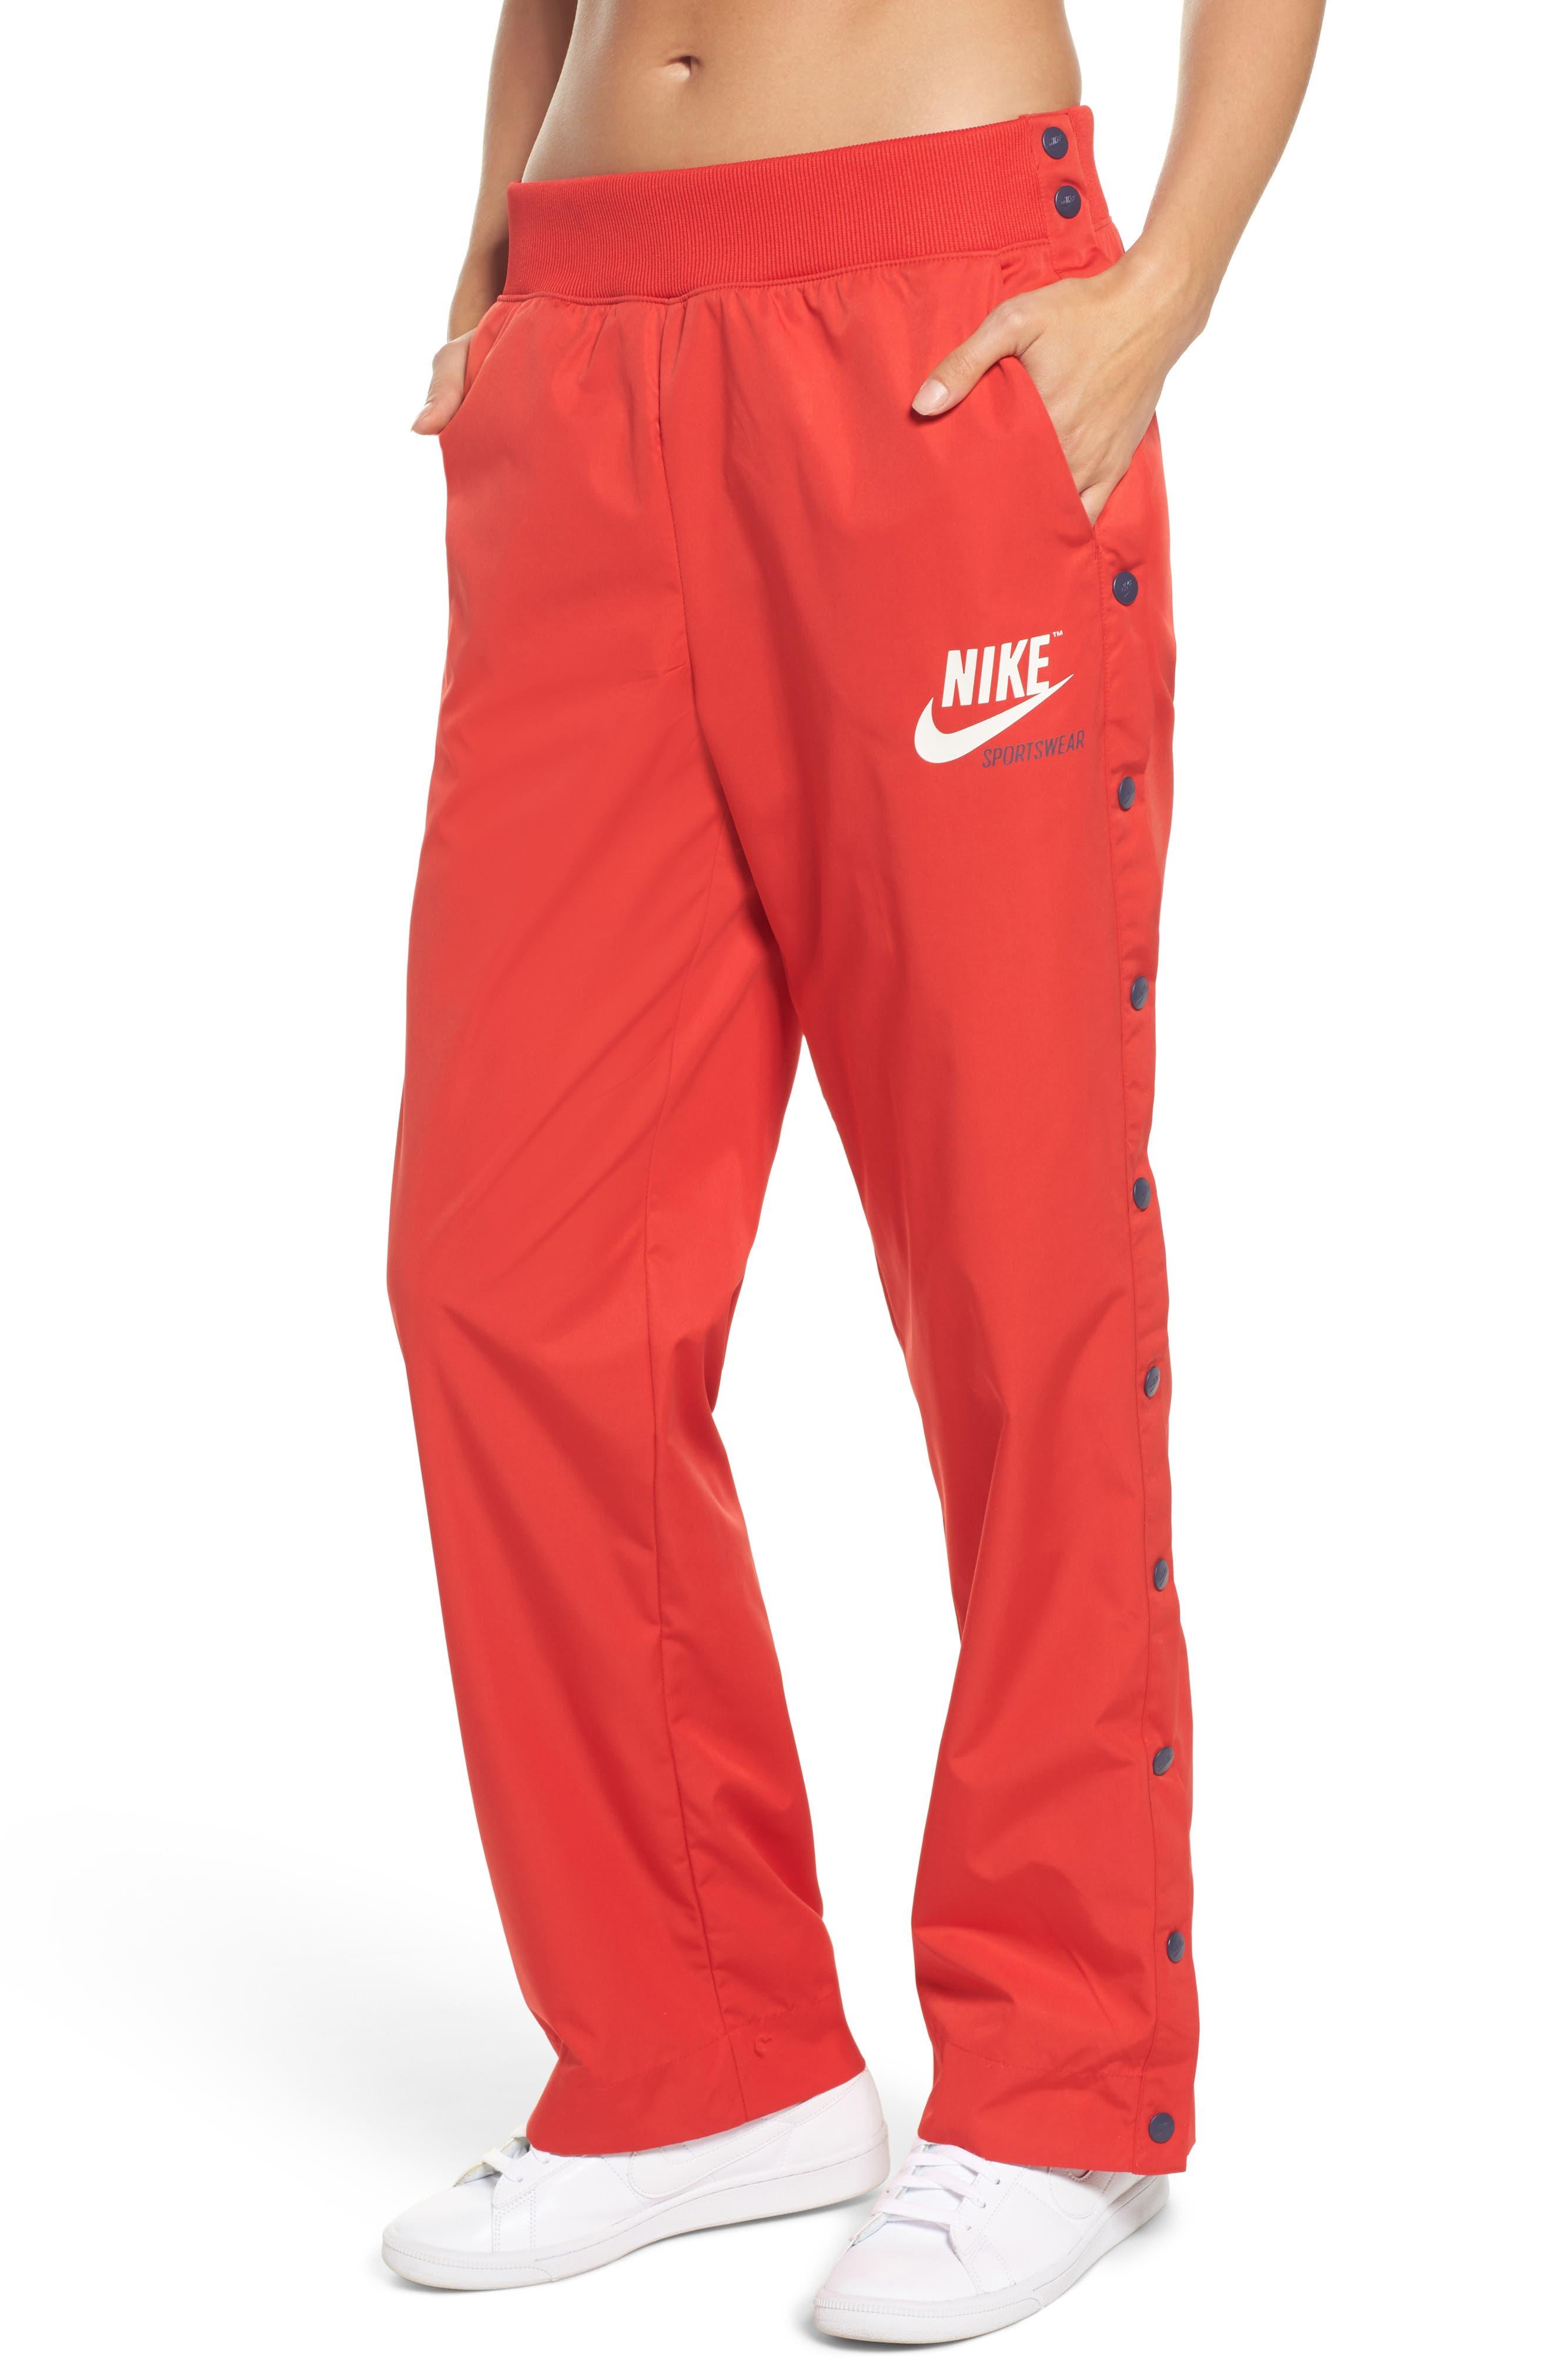 Sportswear Archive Snap Track Pants,                             Main thumbnail 1, color,                             University Red/ Thunder Blue